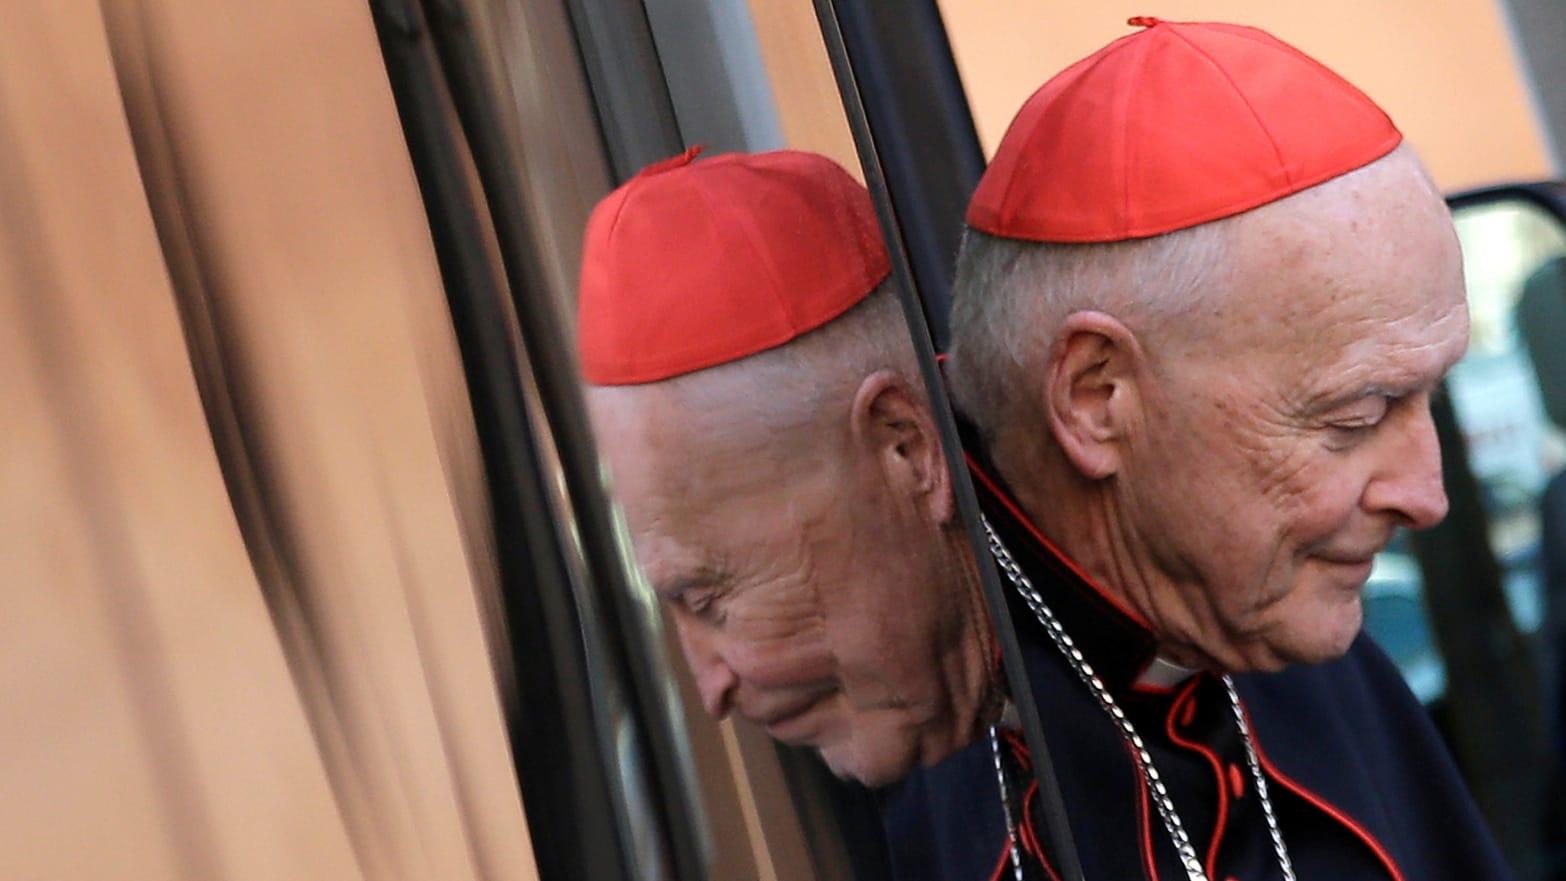 Cardinal McCarrick Becomes Highest-Ranking U.S. Catholic to Be Defrocked